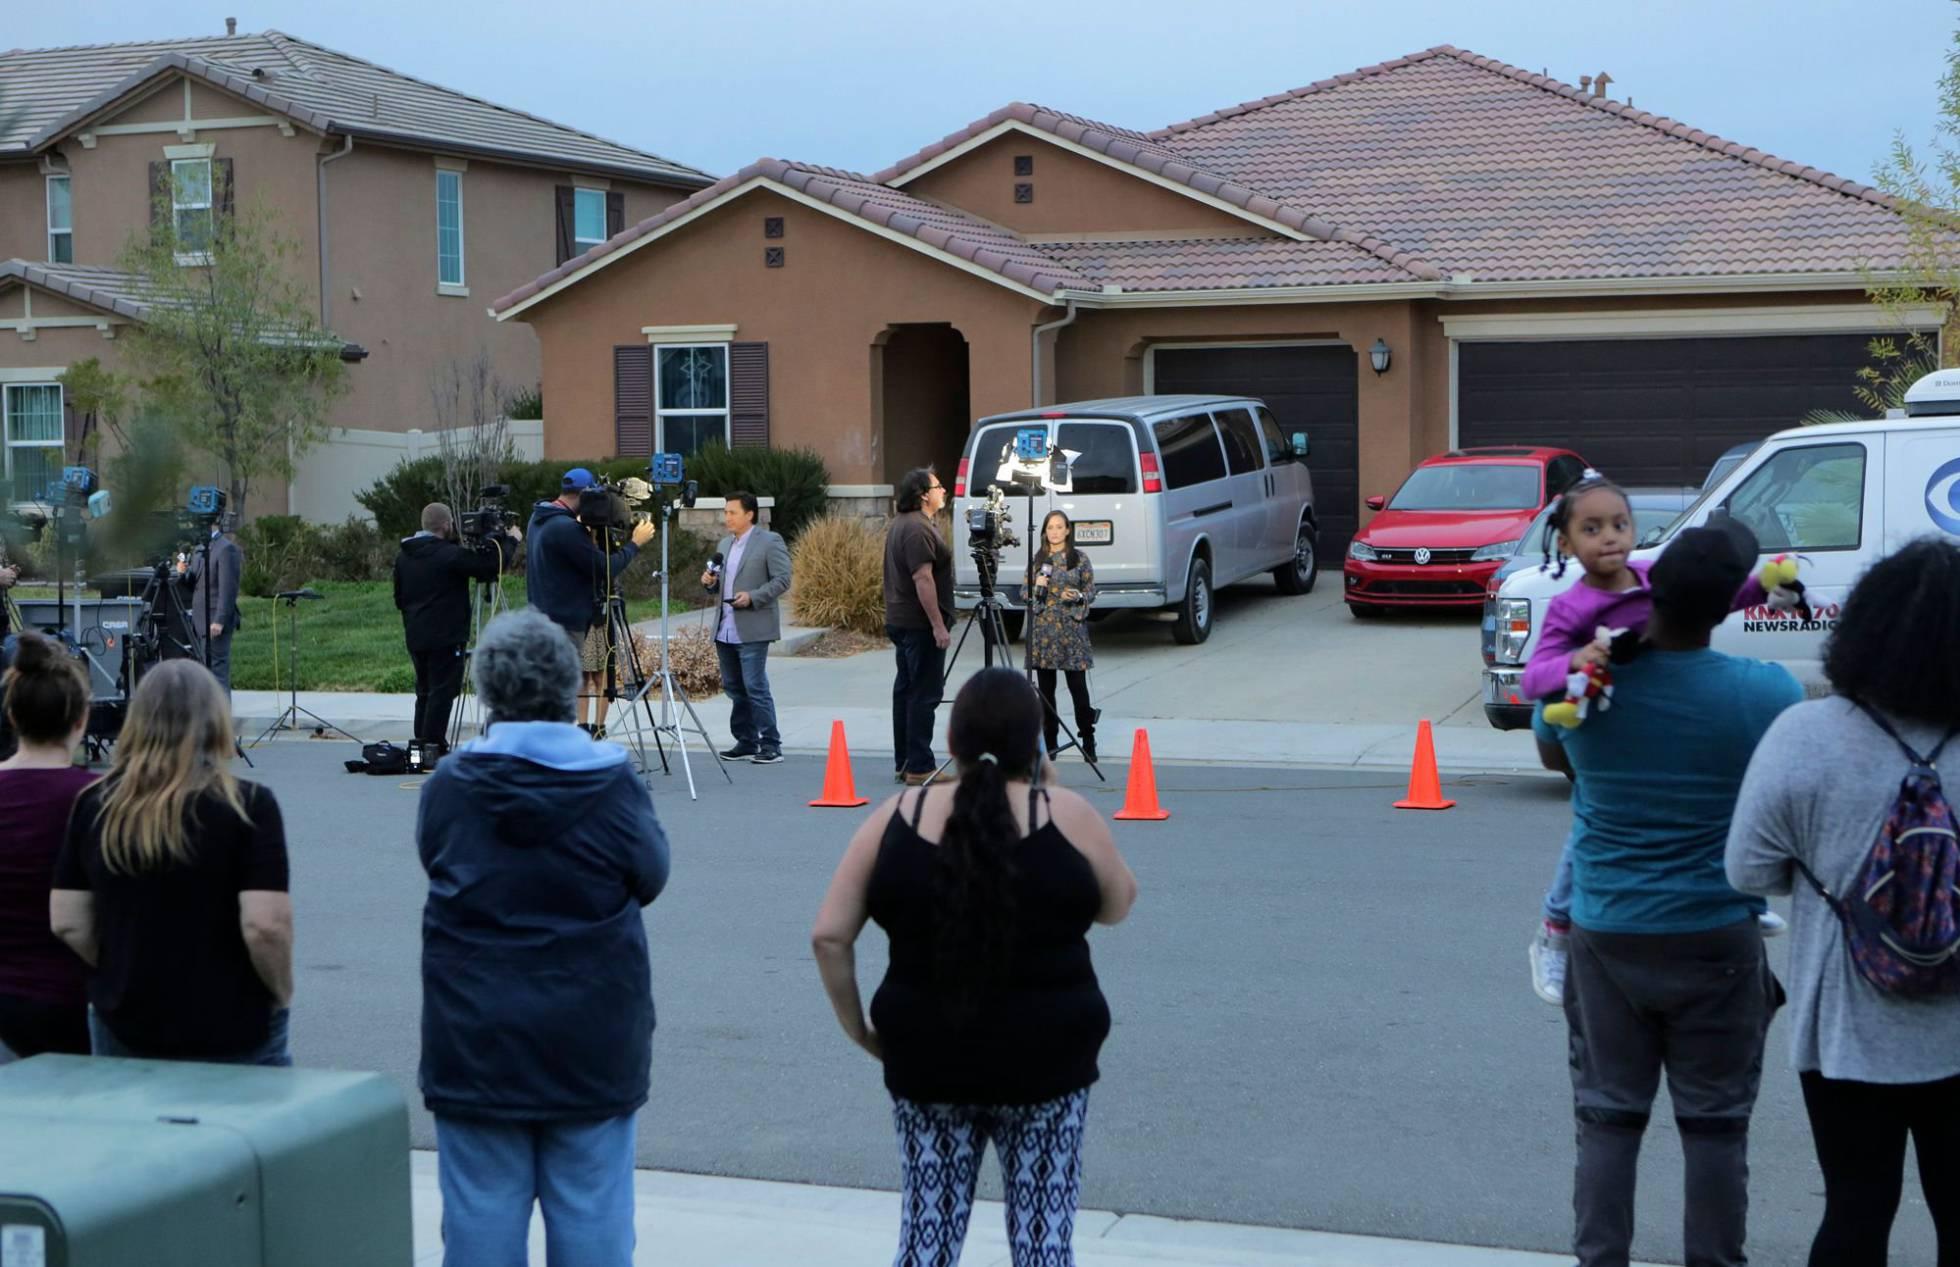 13 people held captive in california home cnn